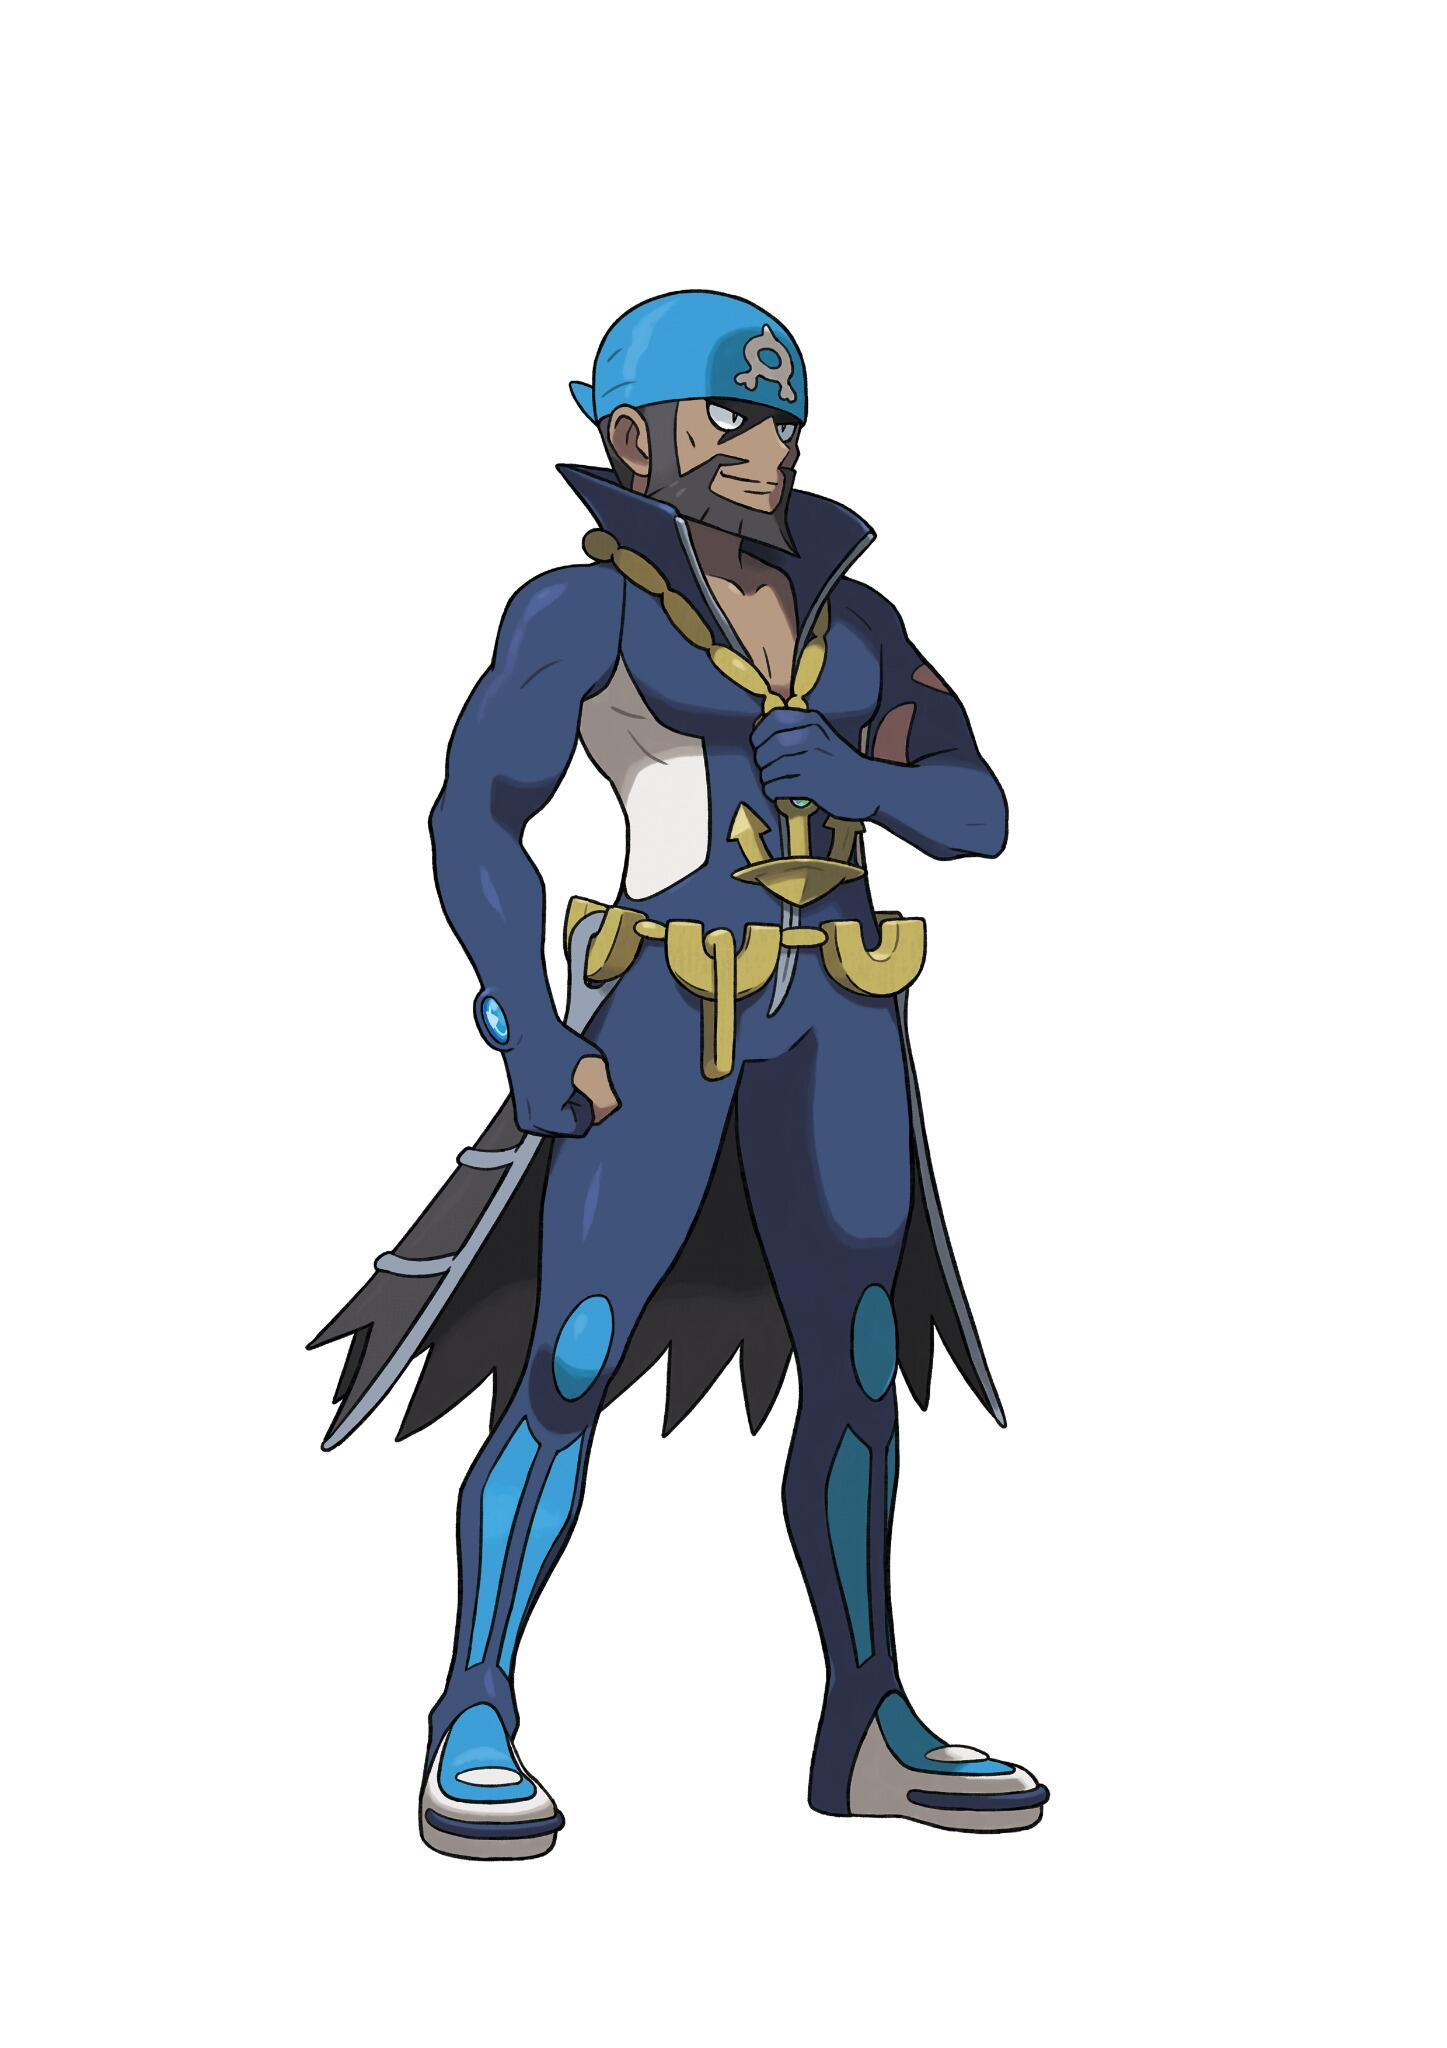 [Discusión General] Pokémon Rubí Omega & Zafiro Alfa - Página 2 Bp75VMRIcAEG1Yy